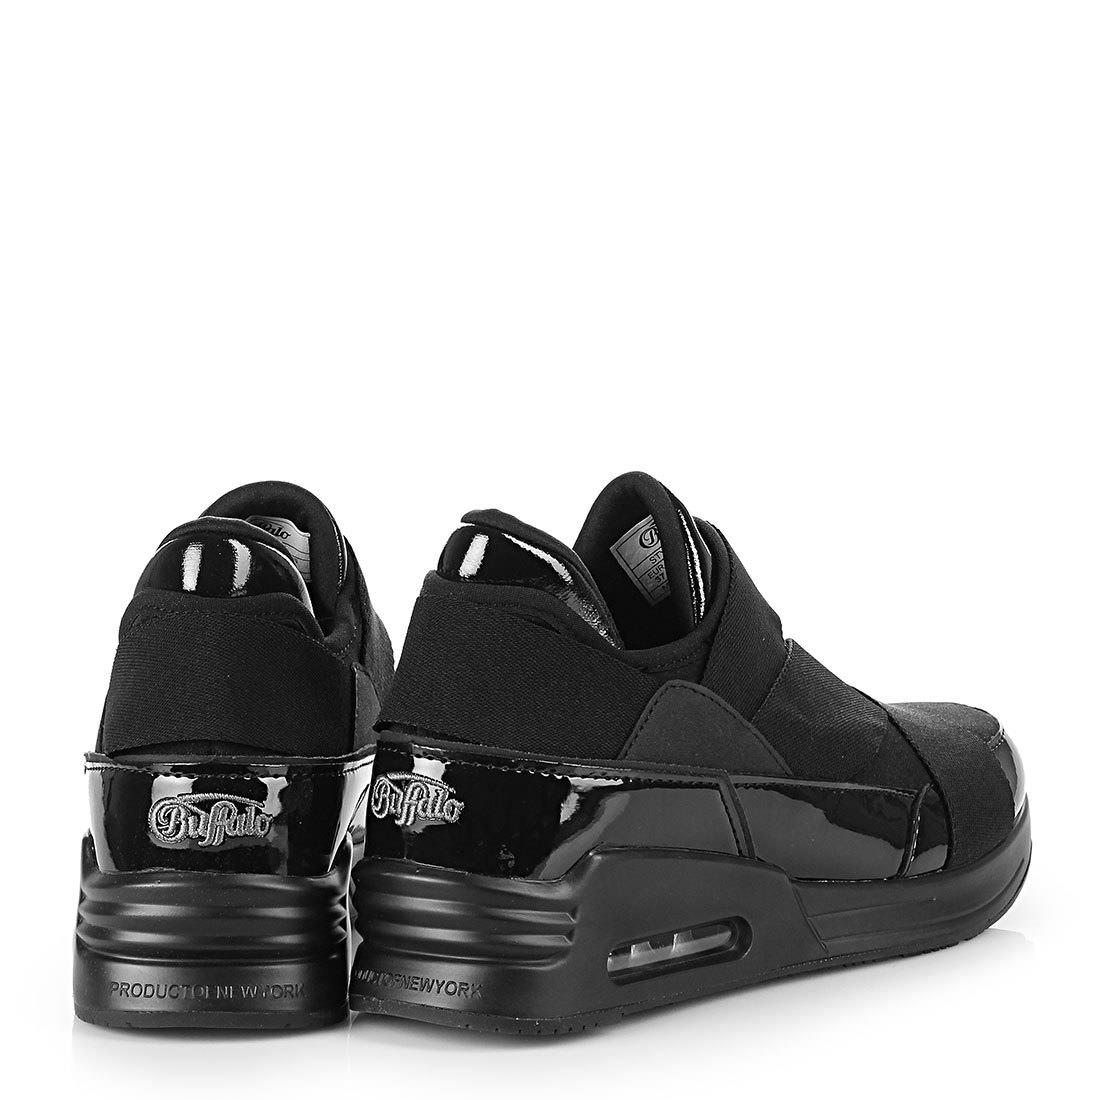 Sneaker in schwarz für Damen Buffalo cheFv9Tud